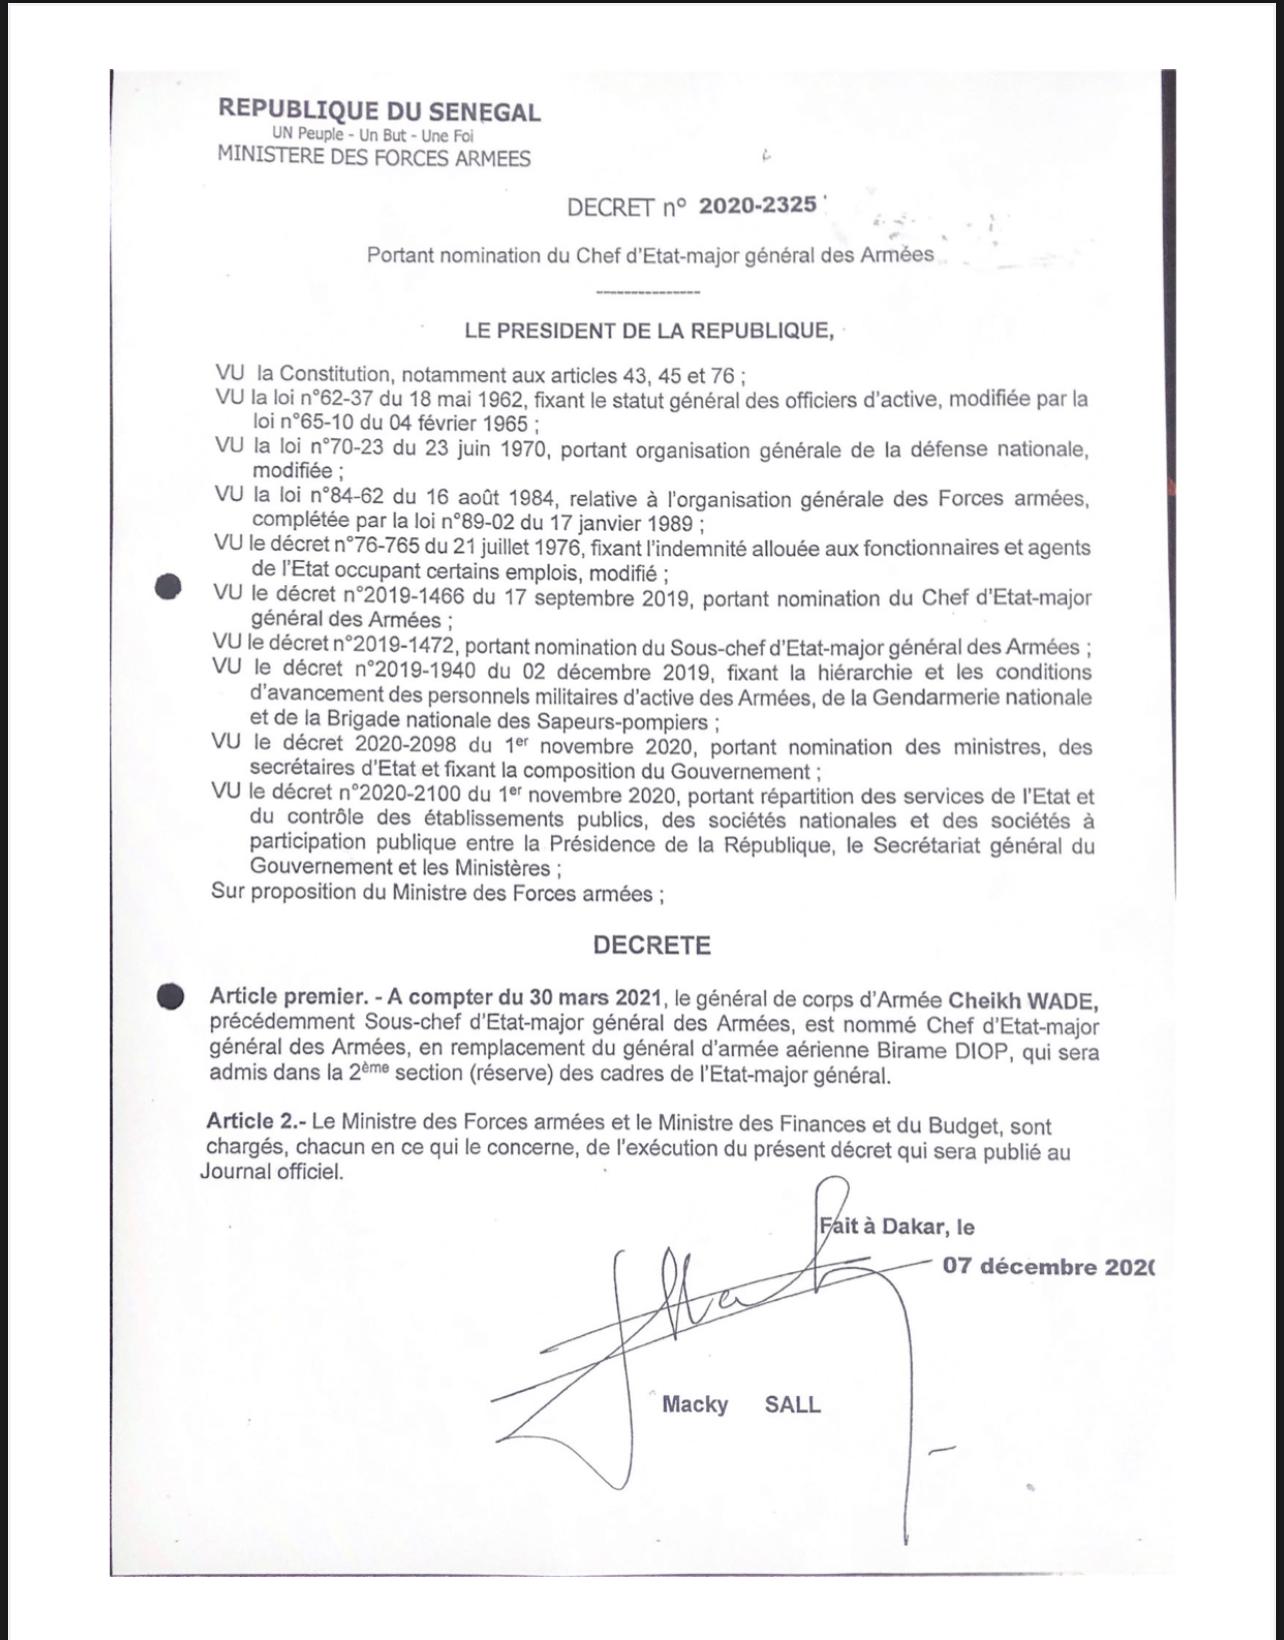 ARMÉE SÉNÉGALAISE : Le Général Cheikh Wade nommé CEMGA. (DÉCRET)